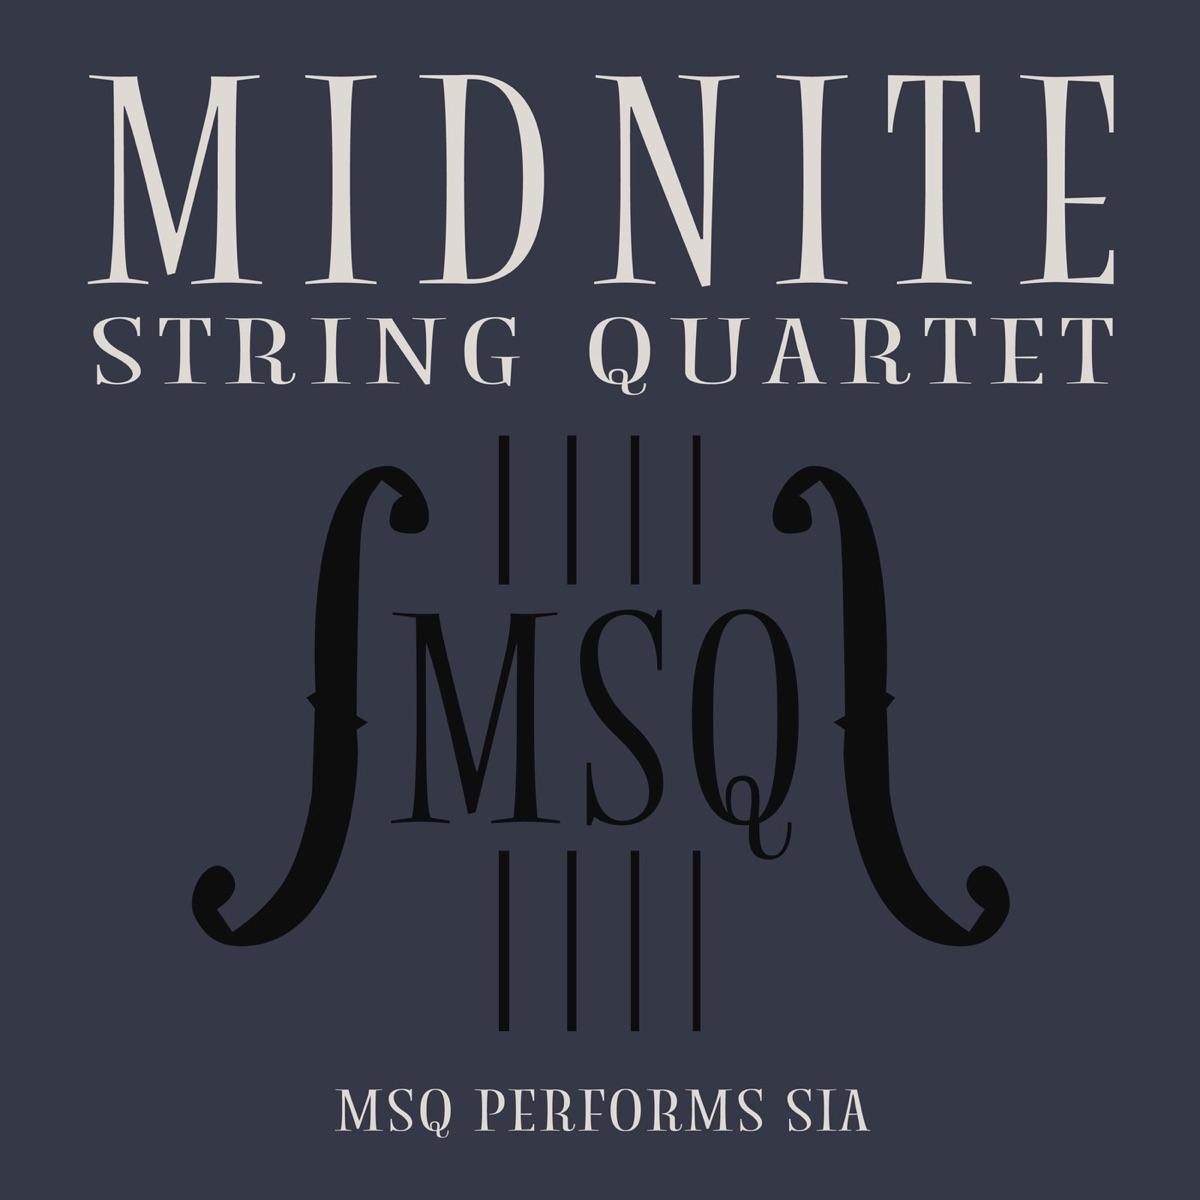 MSQ Performs Sia Midnite String Quartet CD cover